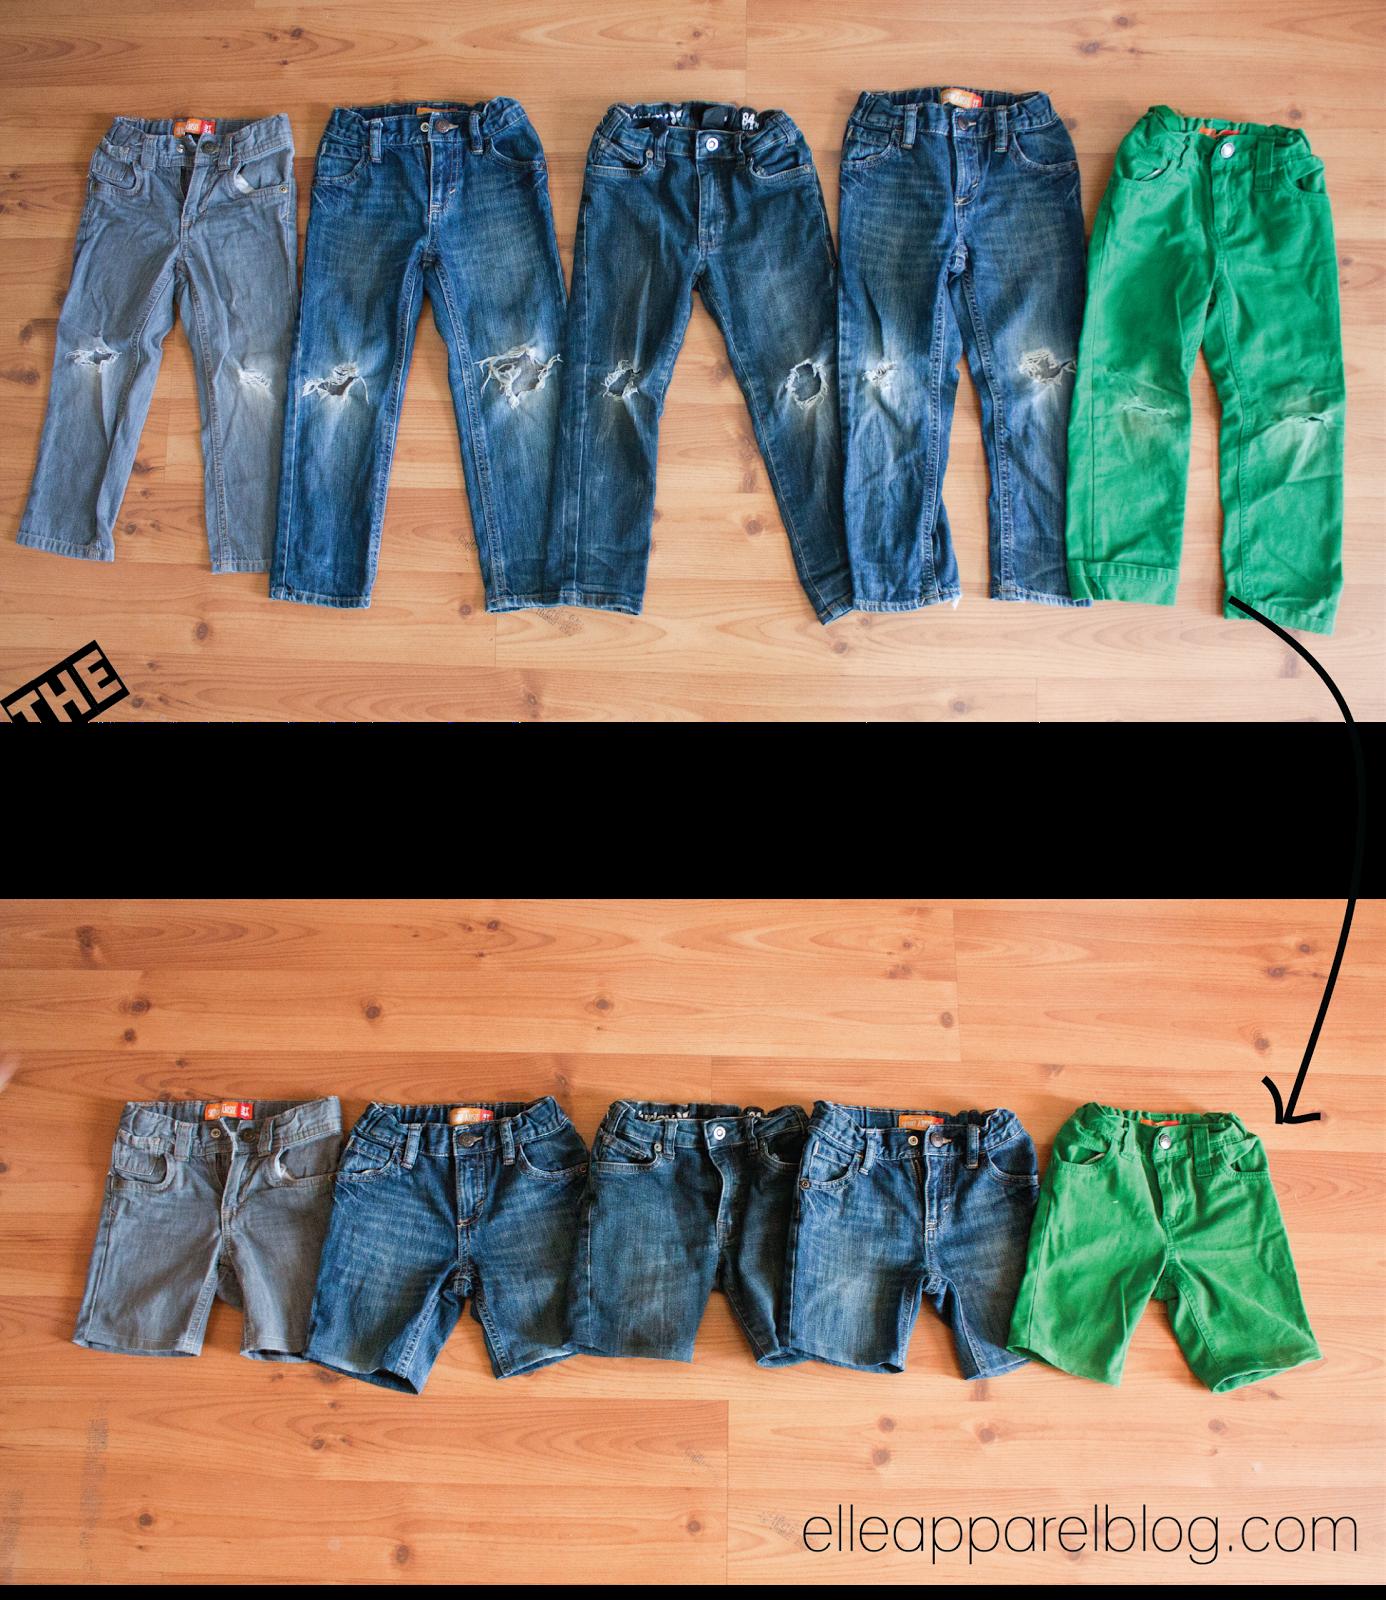 Elle Apparel Kid Shorts Refashion Tutorial Diy Denim Shorts Elle Apparel How To Make Shorts